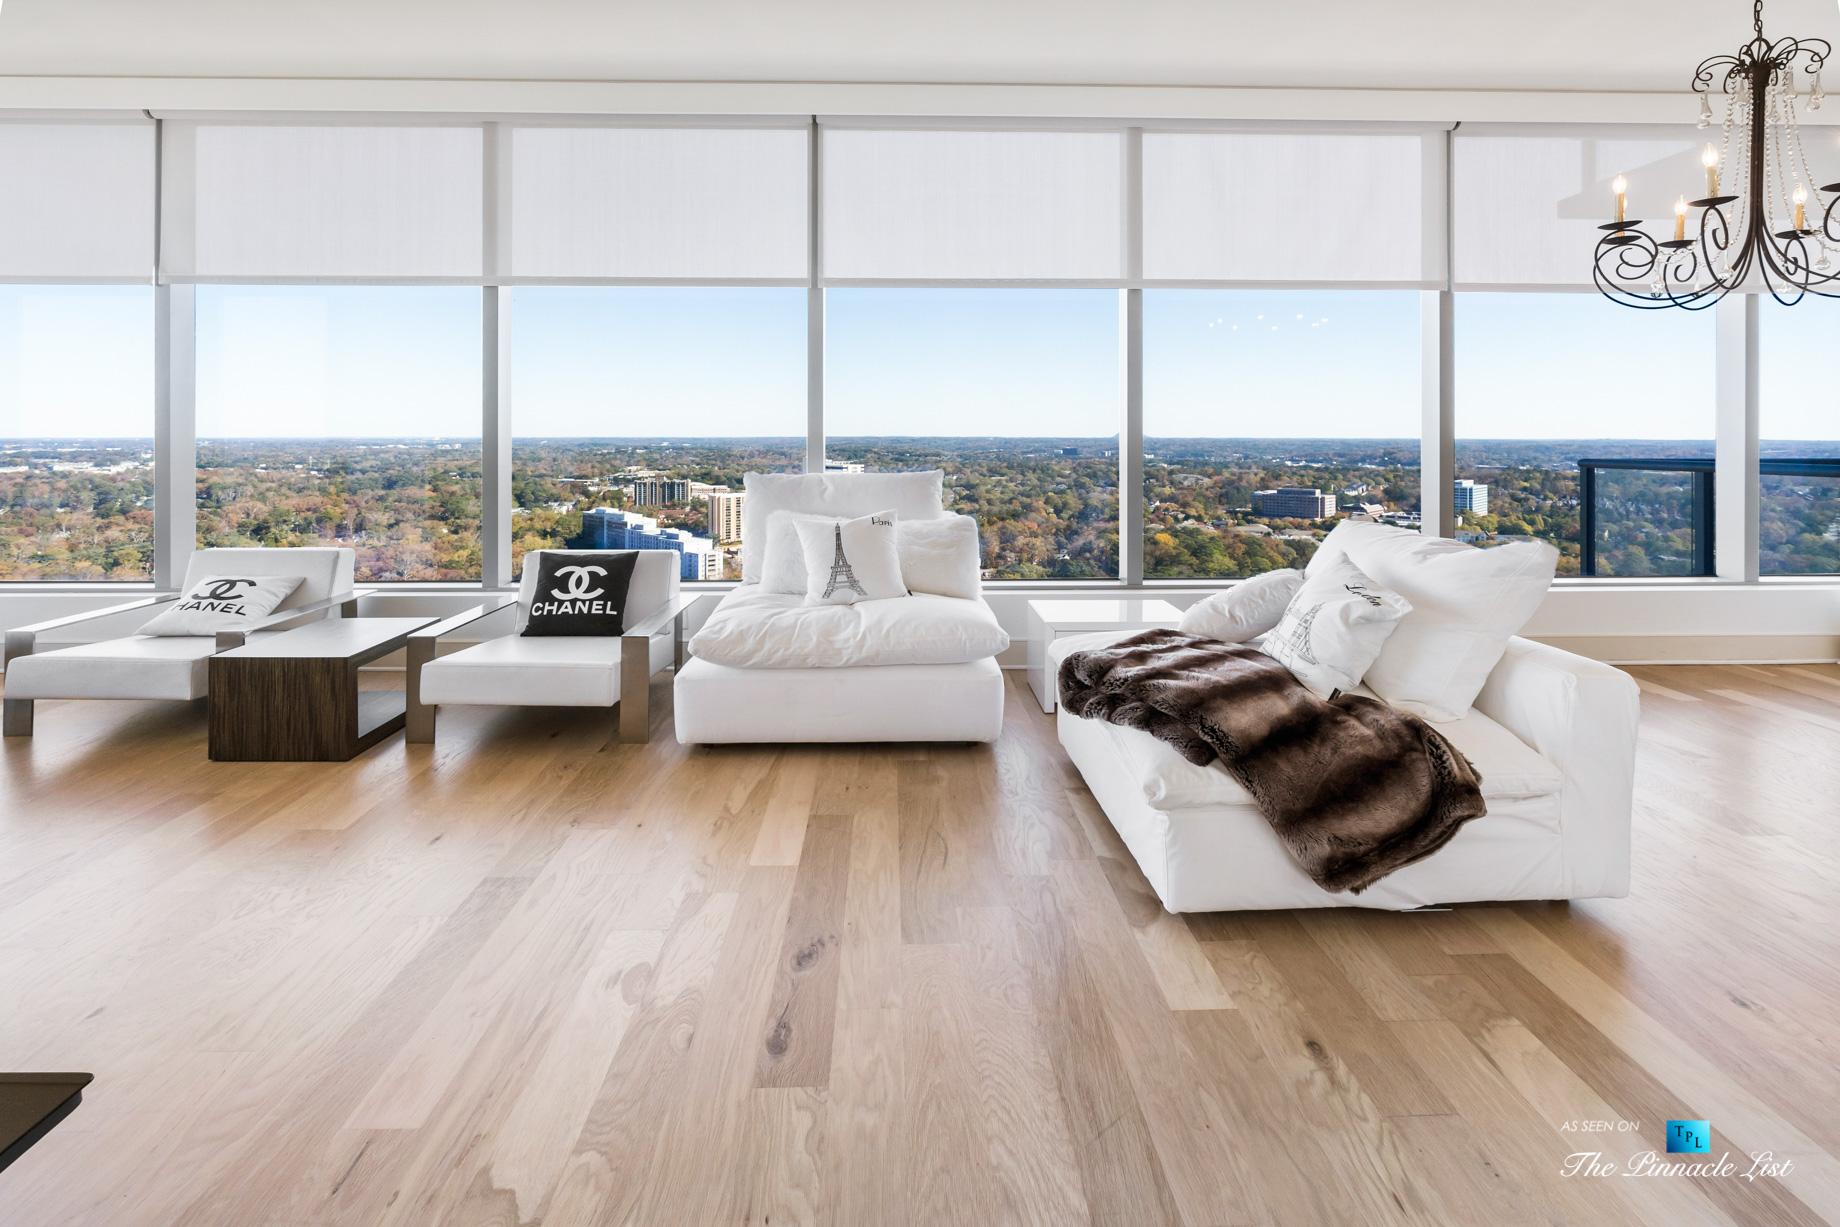 3630 Peachtree Rd NE, Unit 2808, Atlanta, GA, USA – Condo Living Room Window View – Luxury Real Estate – The Ritz-Carlton Residences Buckhead